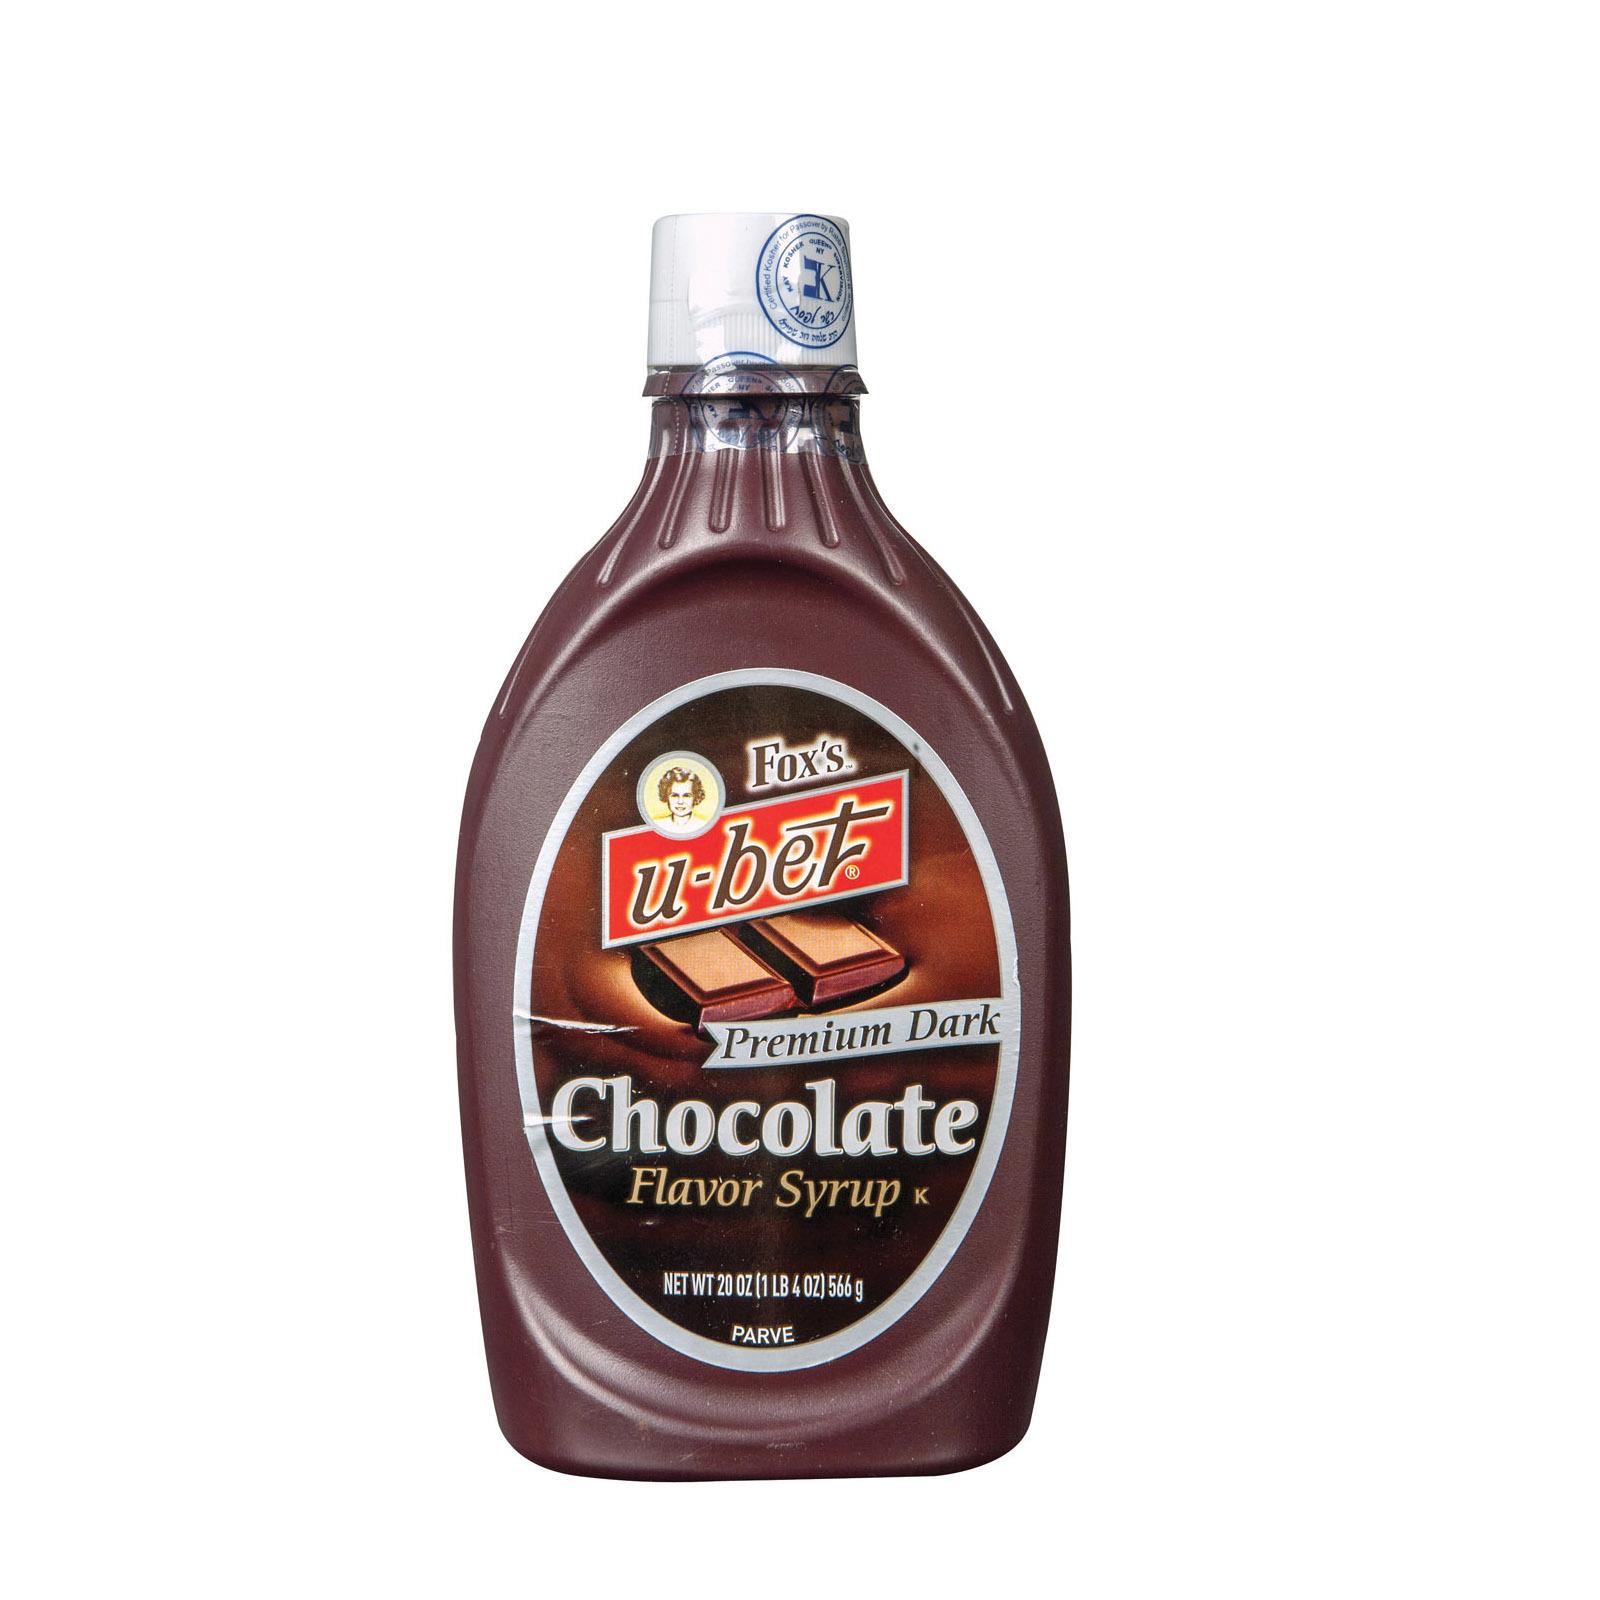 Fox's U - Bet Premium Dark Chocolate - Dark Chocolate - Case of 12 - 20 oz.